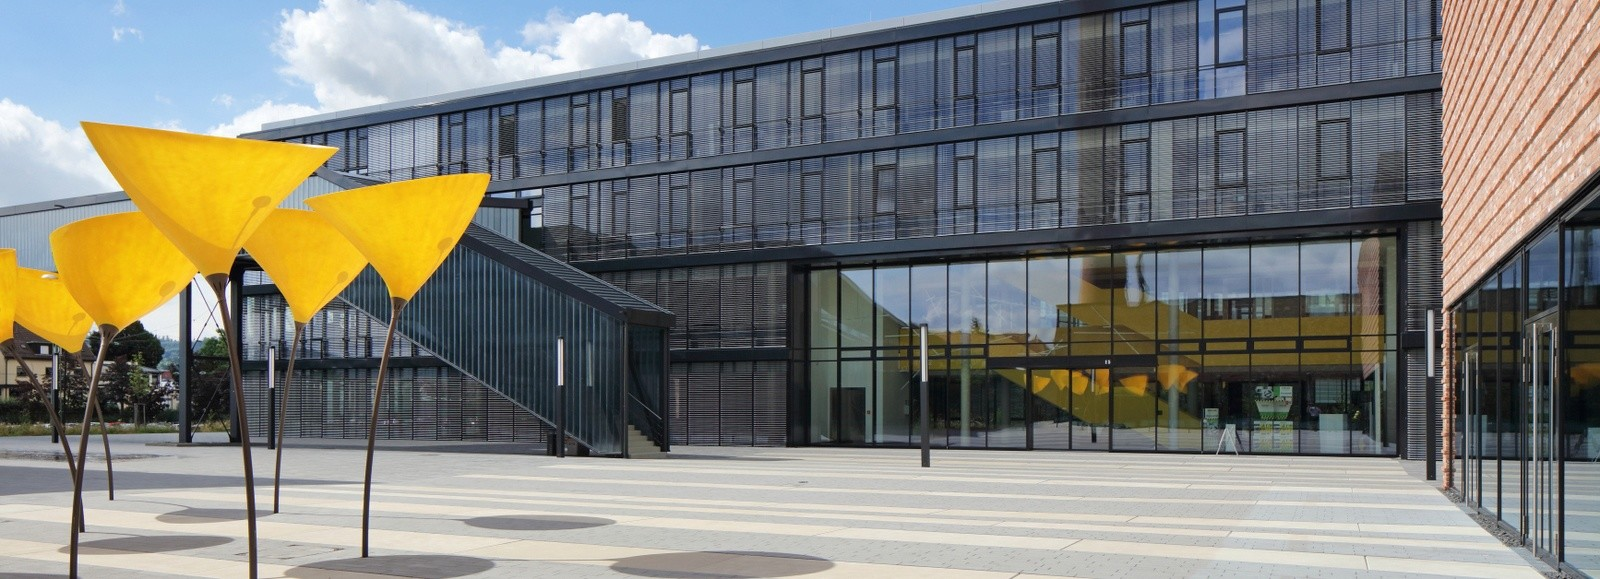 Компания Kärcher достигла рекордного оборота в 2,5 миллиарда евро